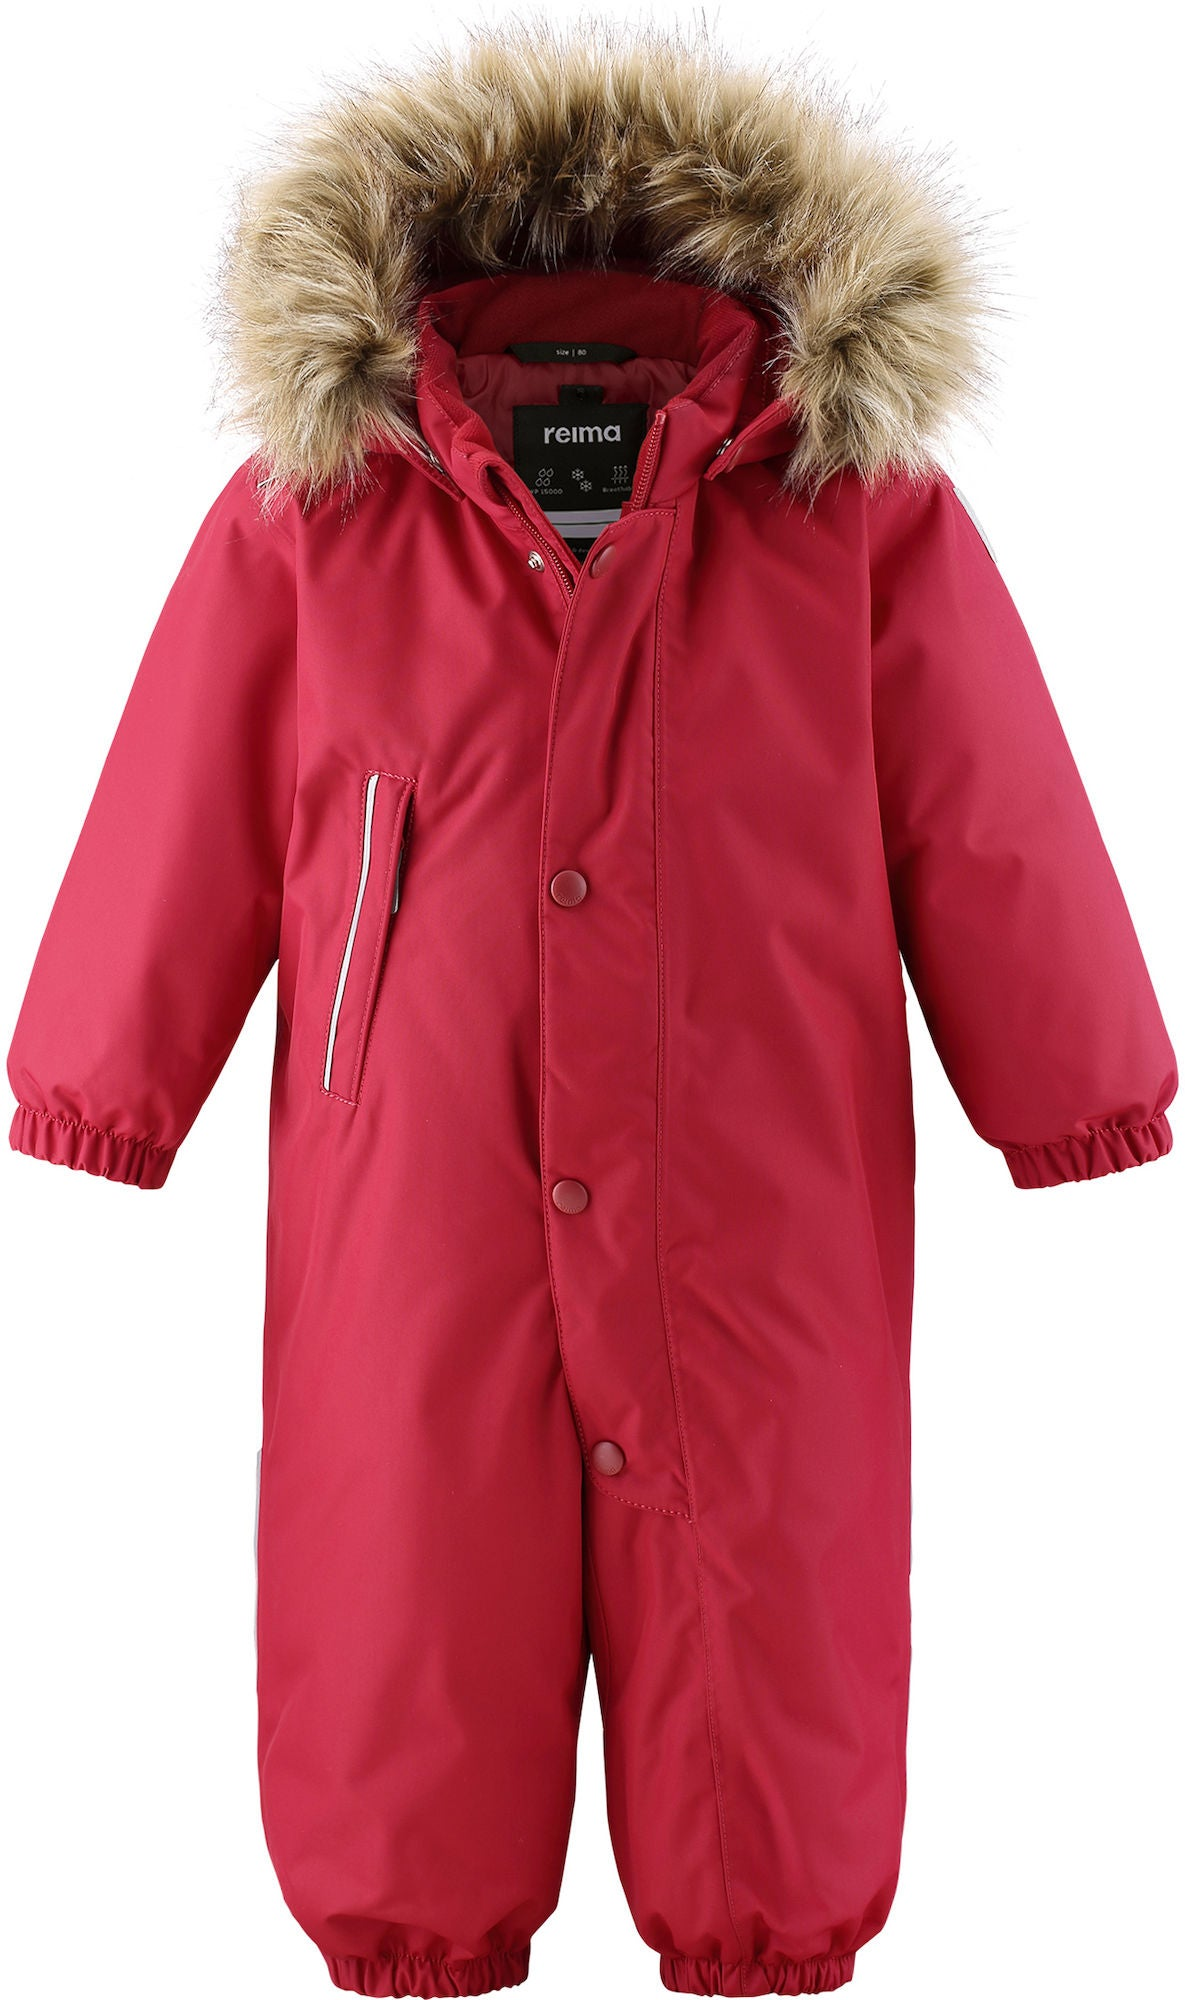 Reimatec Gotland Overall, Lingonberry Red, 74